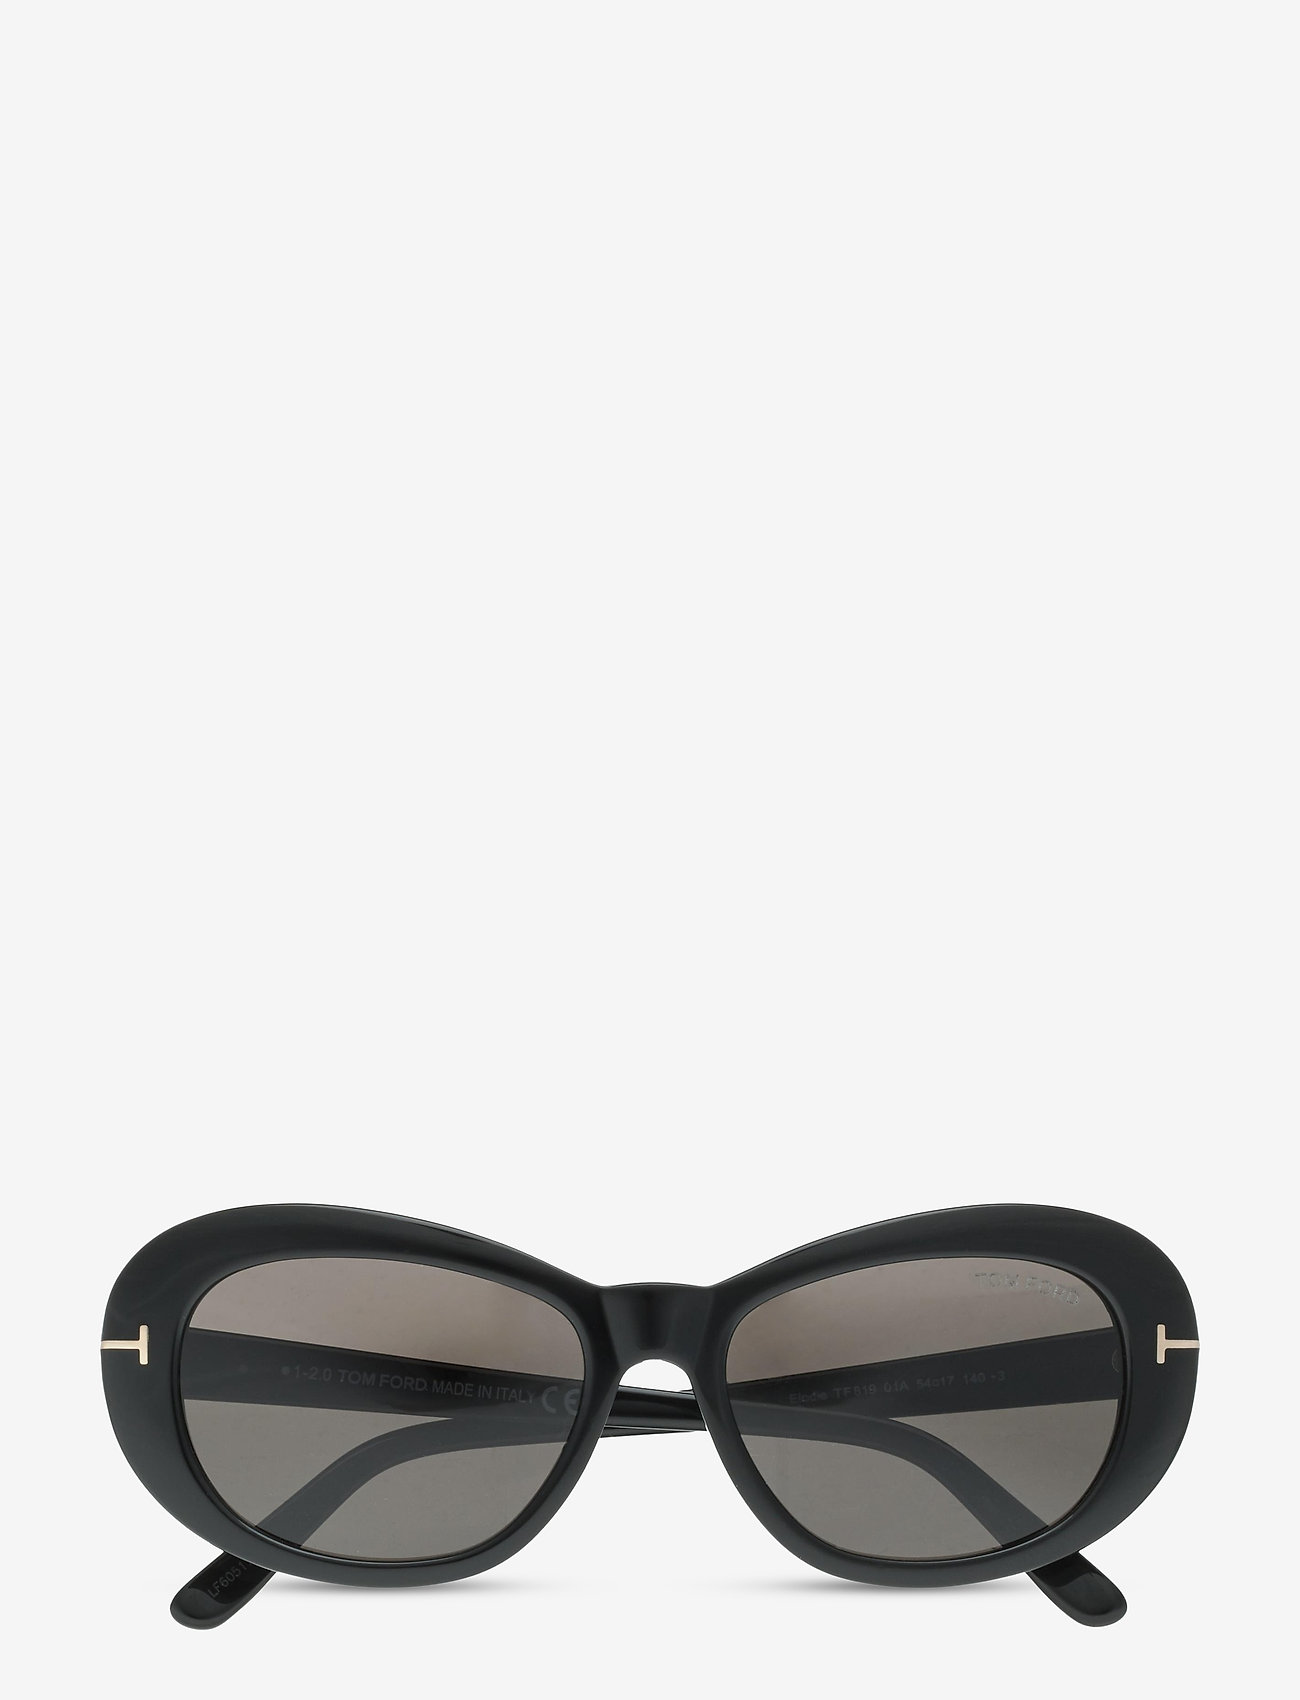 Tom Ford Sunglasses - ELODIE - rond model - shiny black - 0